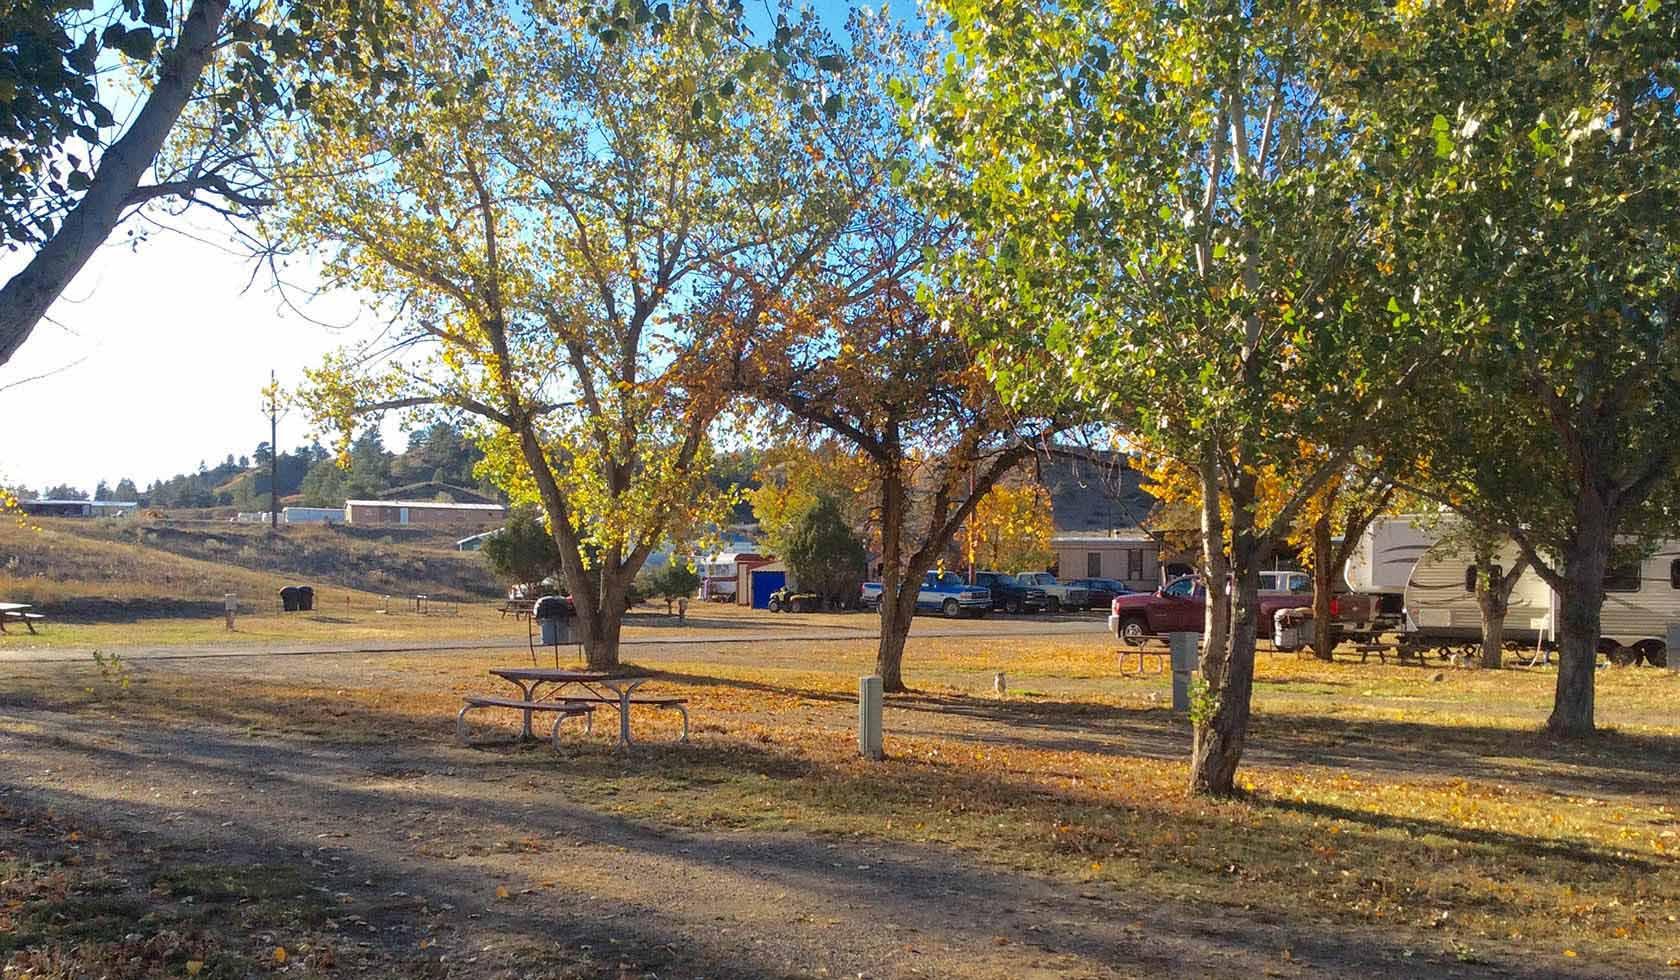 Montana rosebud county forsyth - Go To Previous Media Carousel Slide